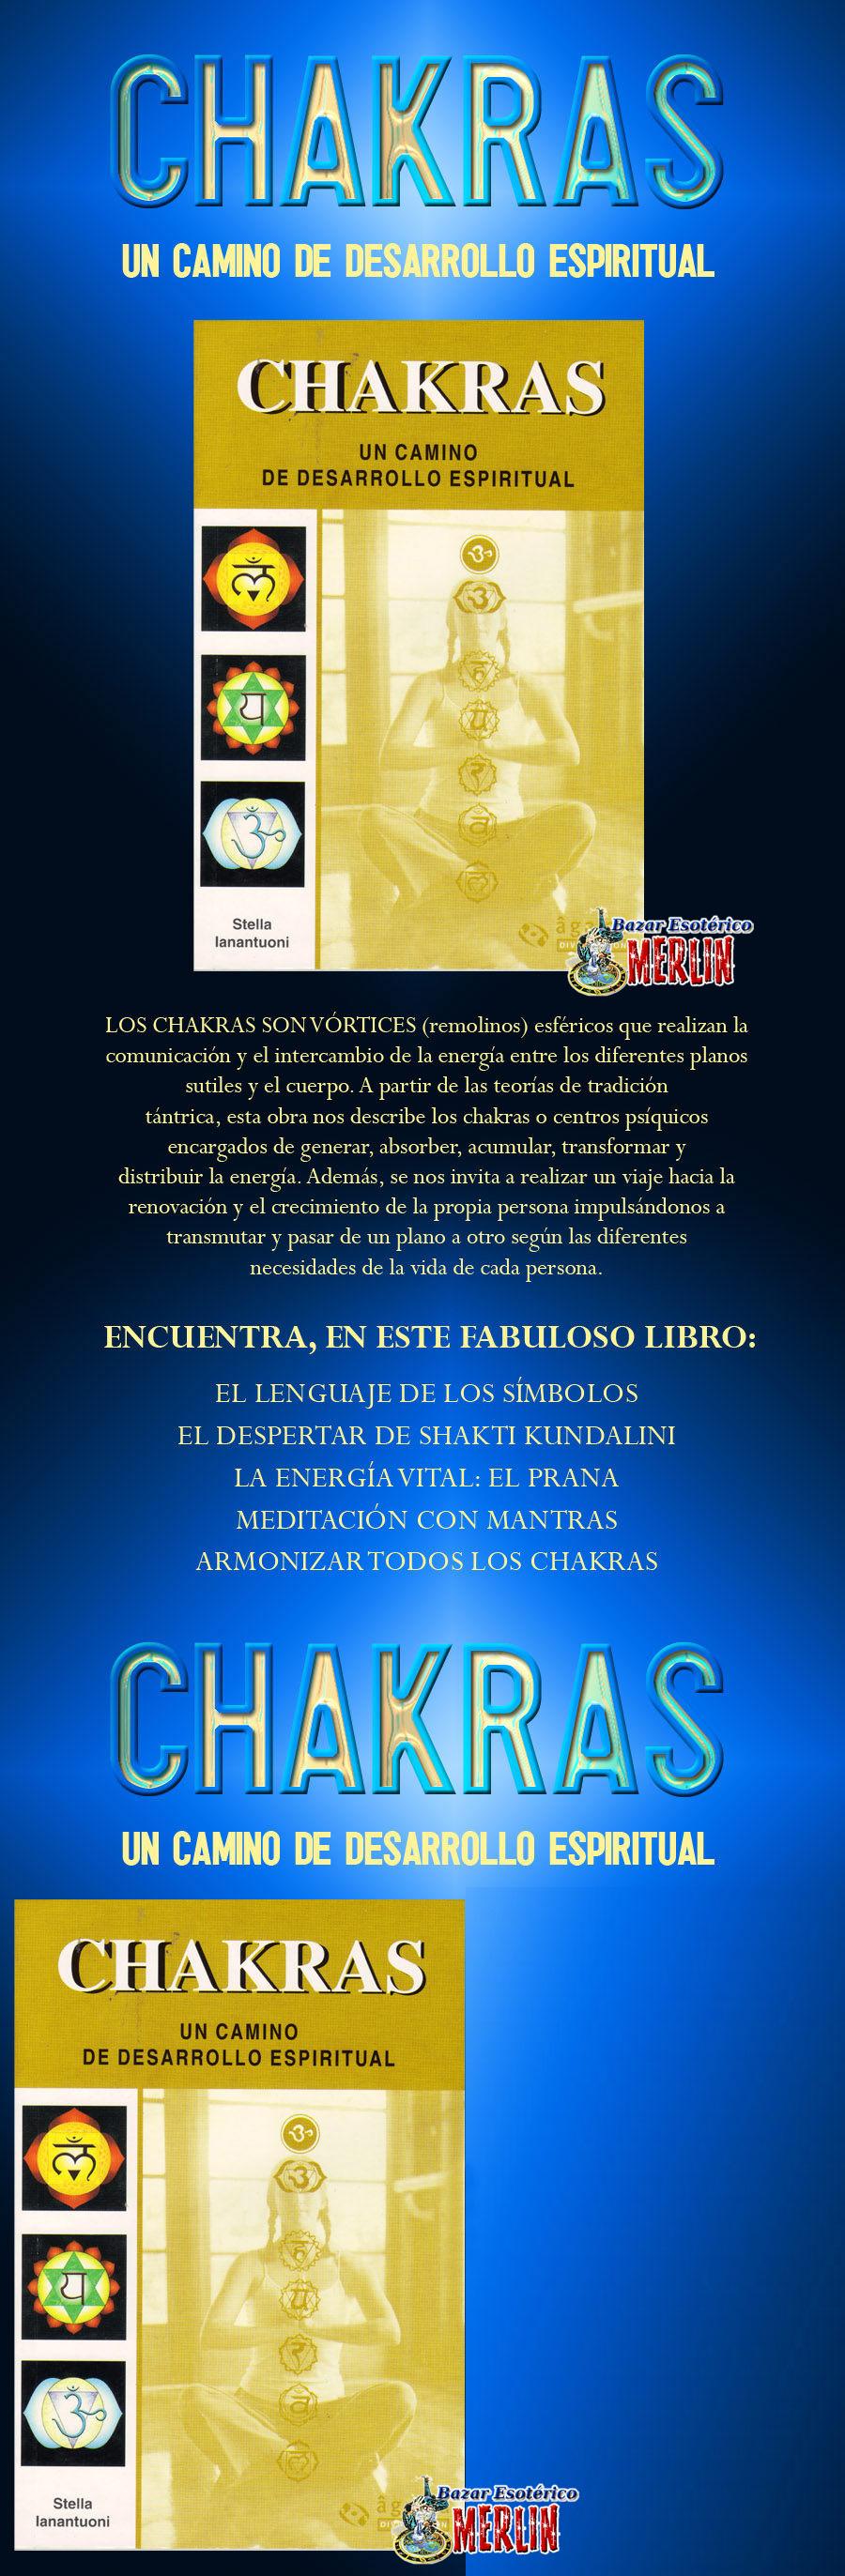 chakras-un-camino-de-desarrollo-espiritual-diseno-01